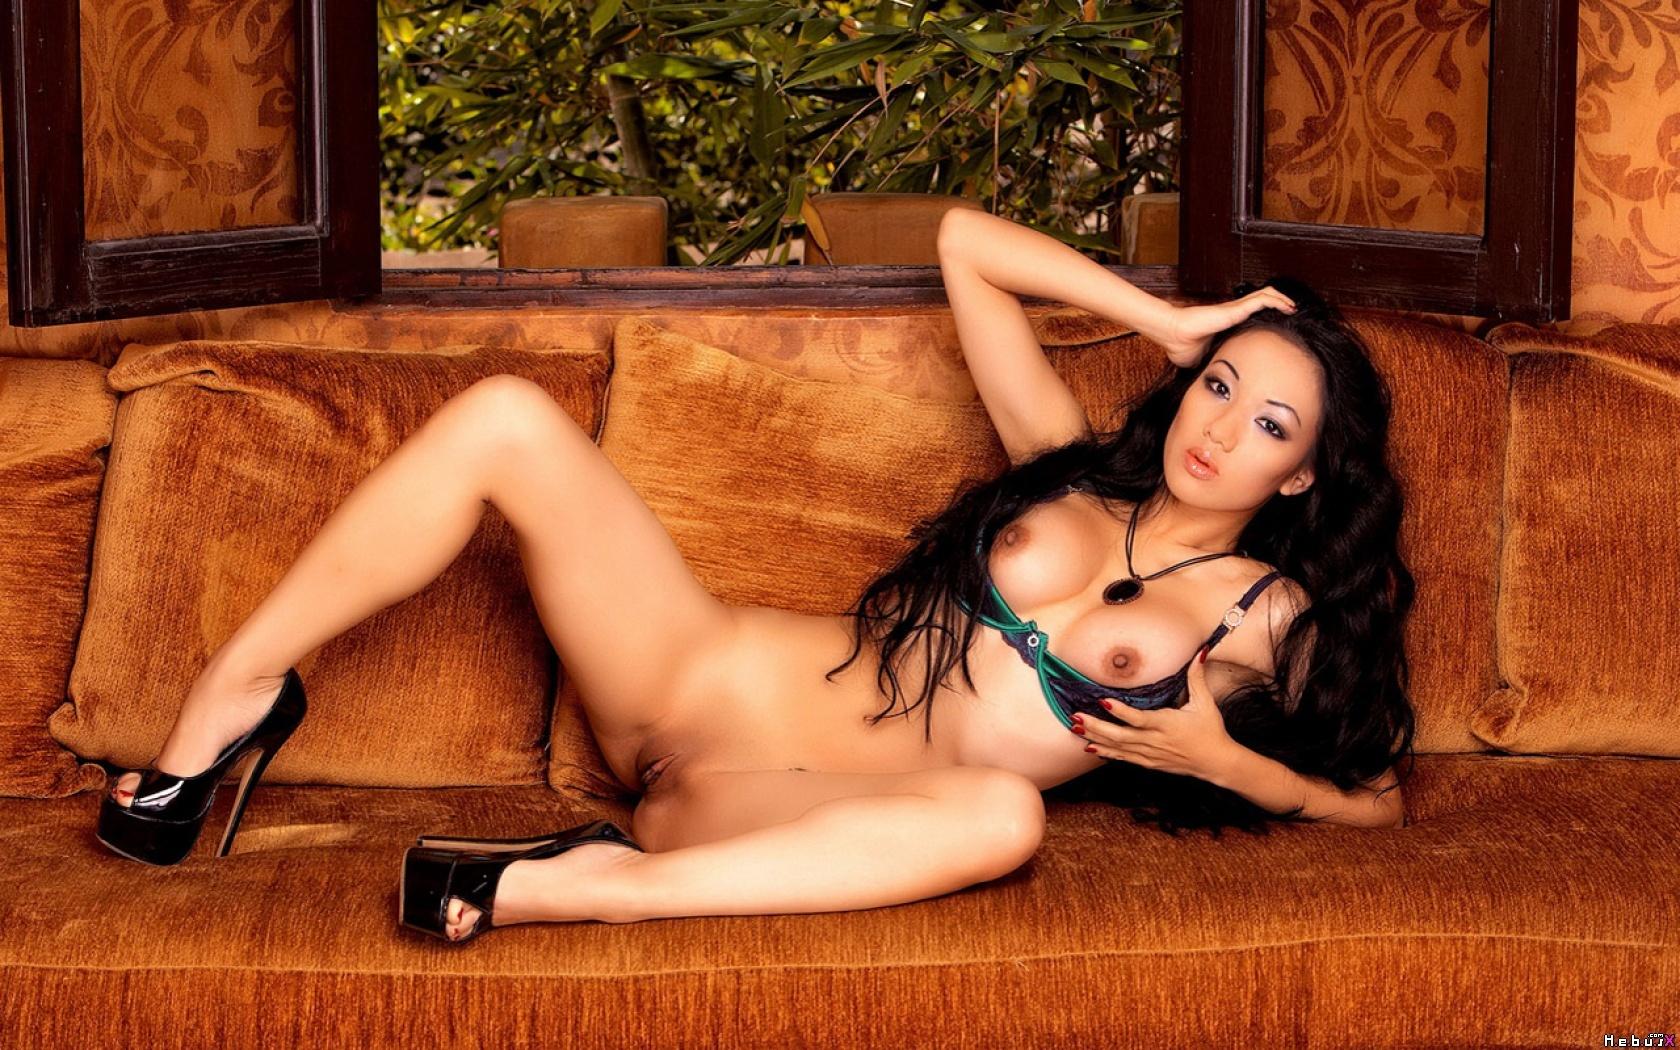 For Jade vixen naked agree